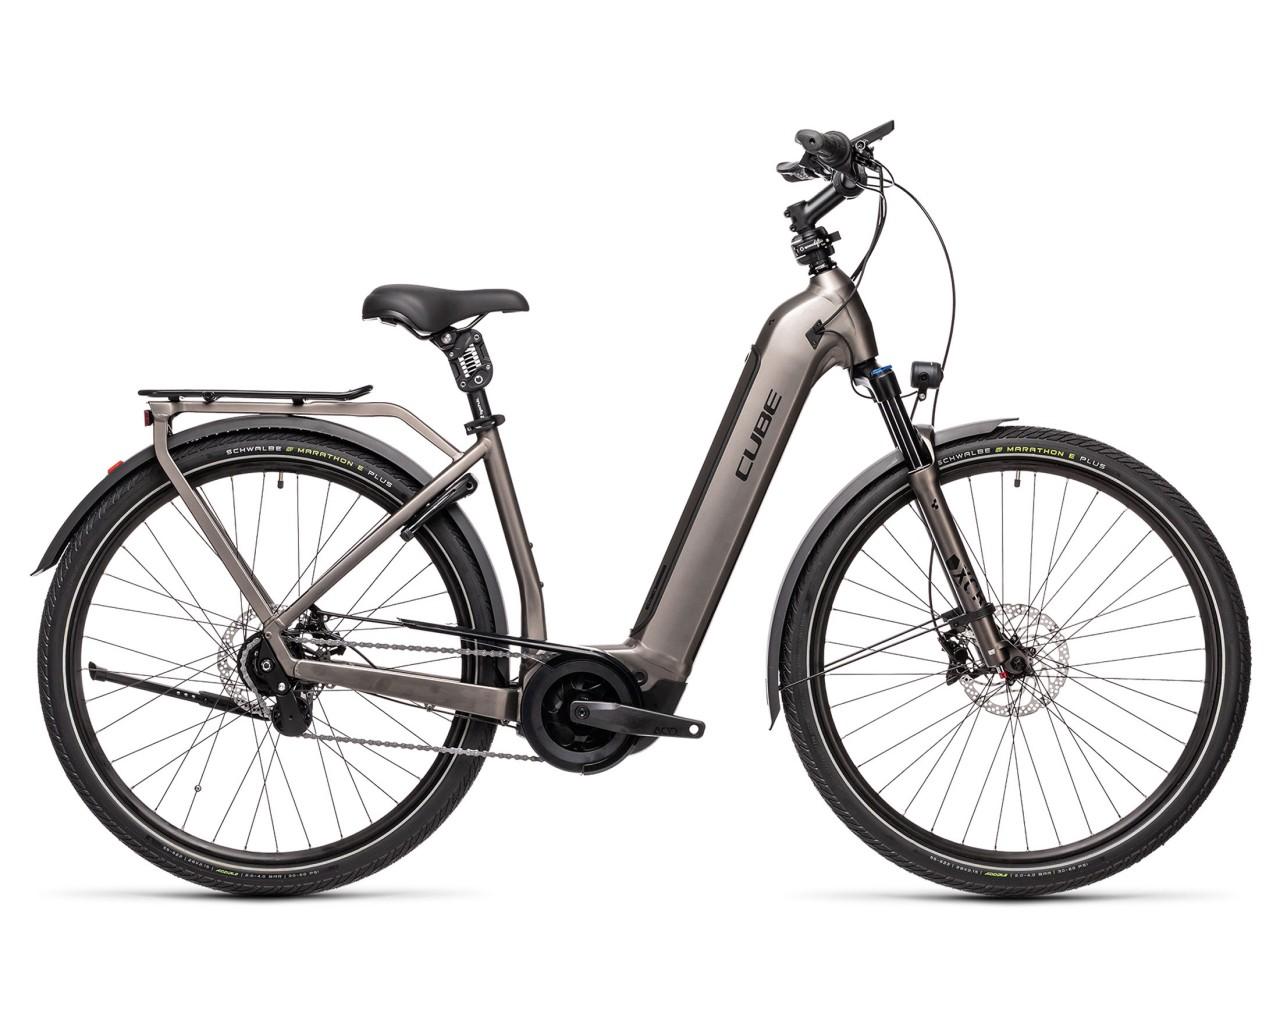 Cube Town Hybrid SL 625 29 Easy Entry - Pedelec City Bike 2021 | teak n black